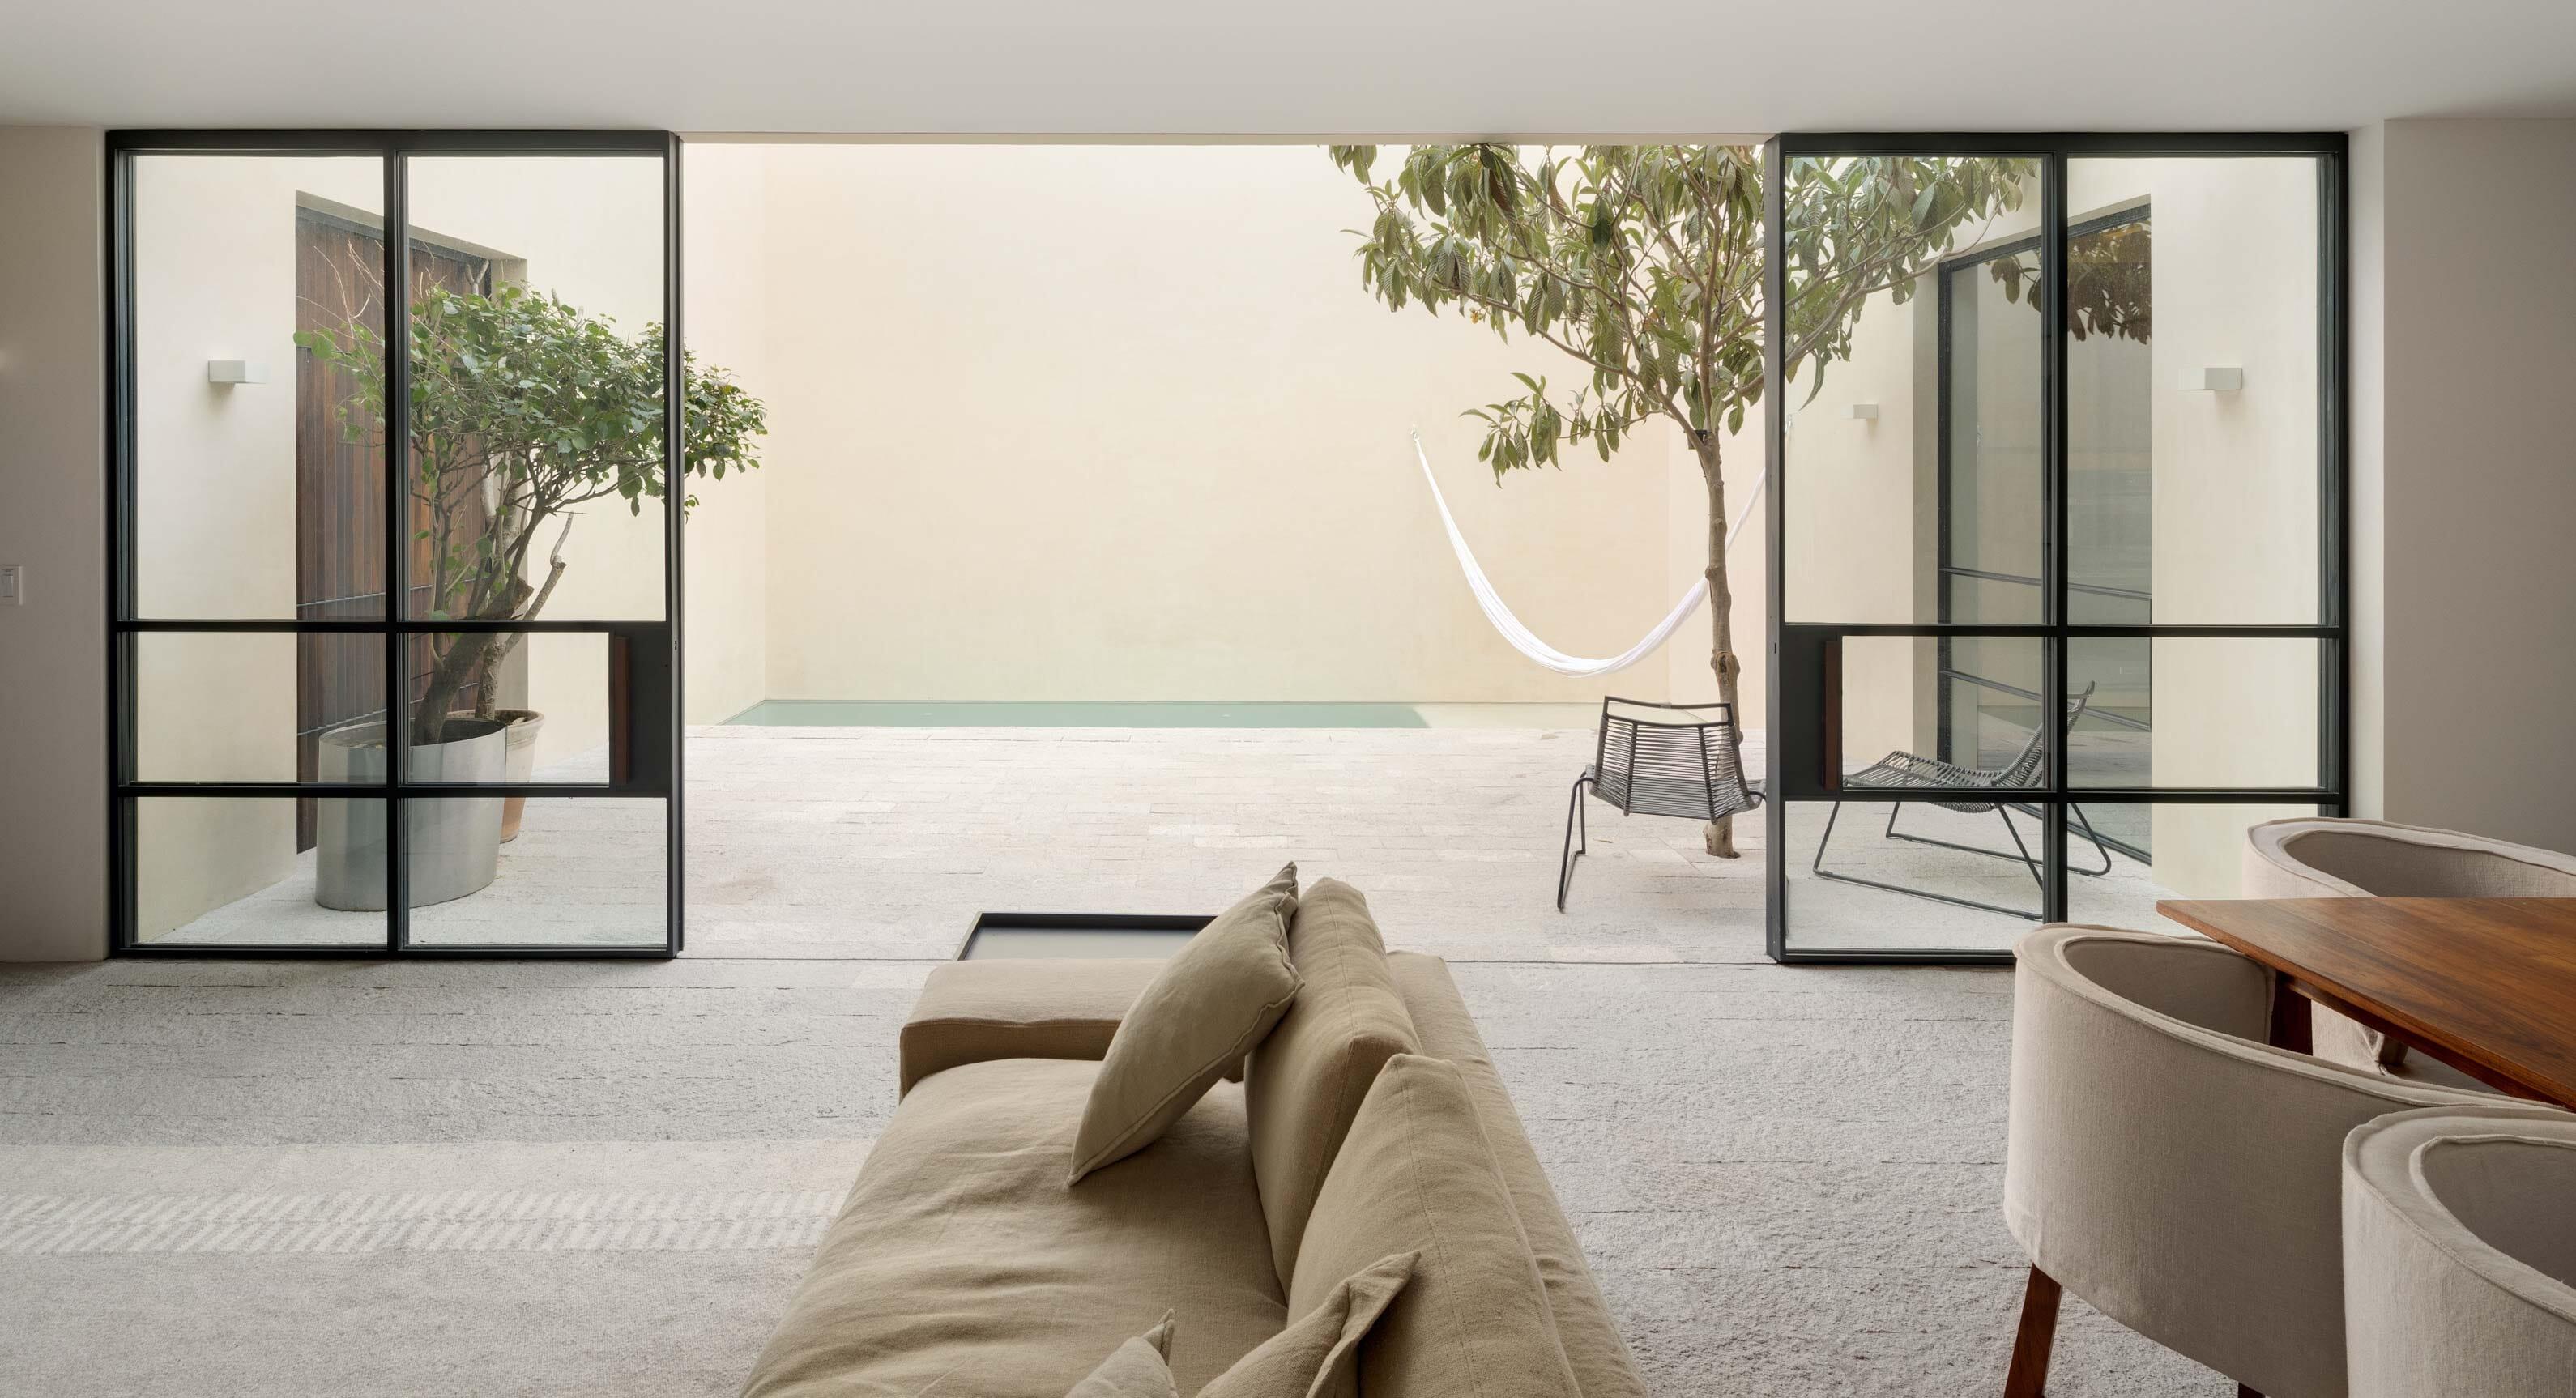 Casa La Quinta: A House Designed Around Different Voids